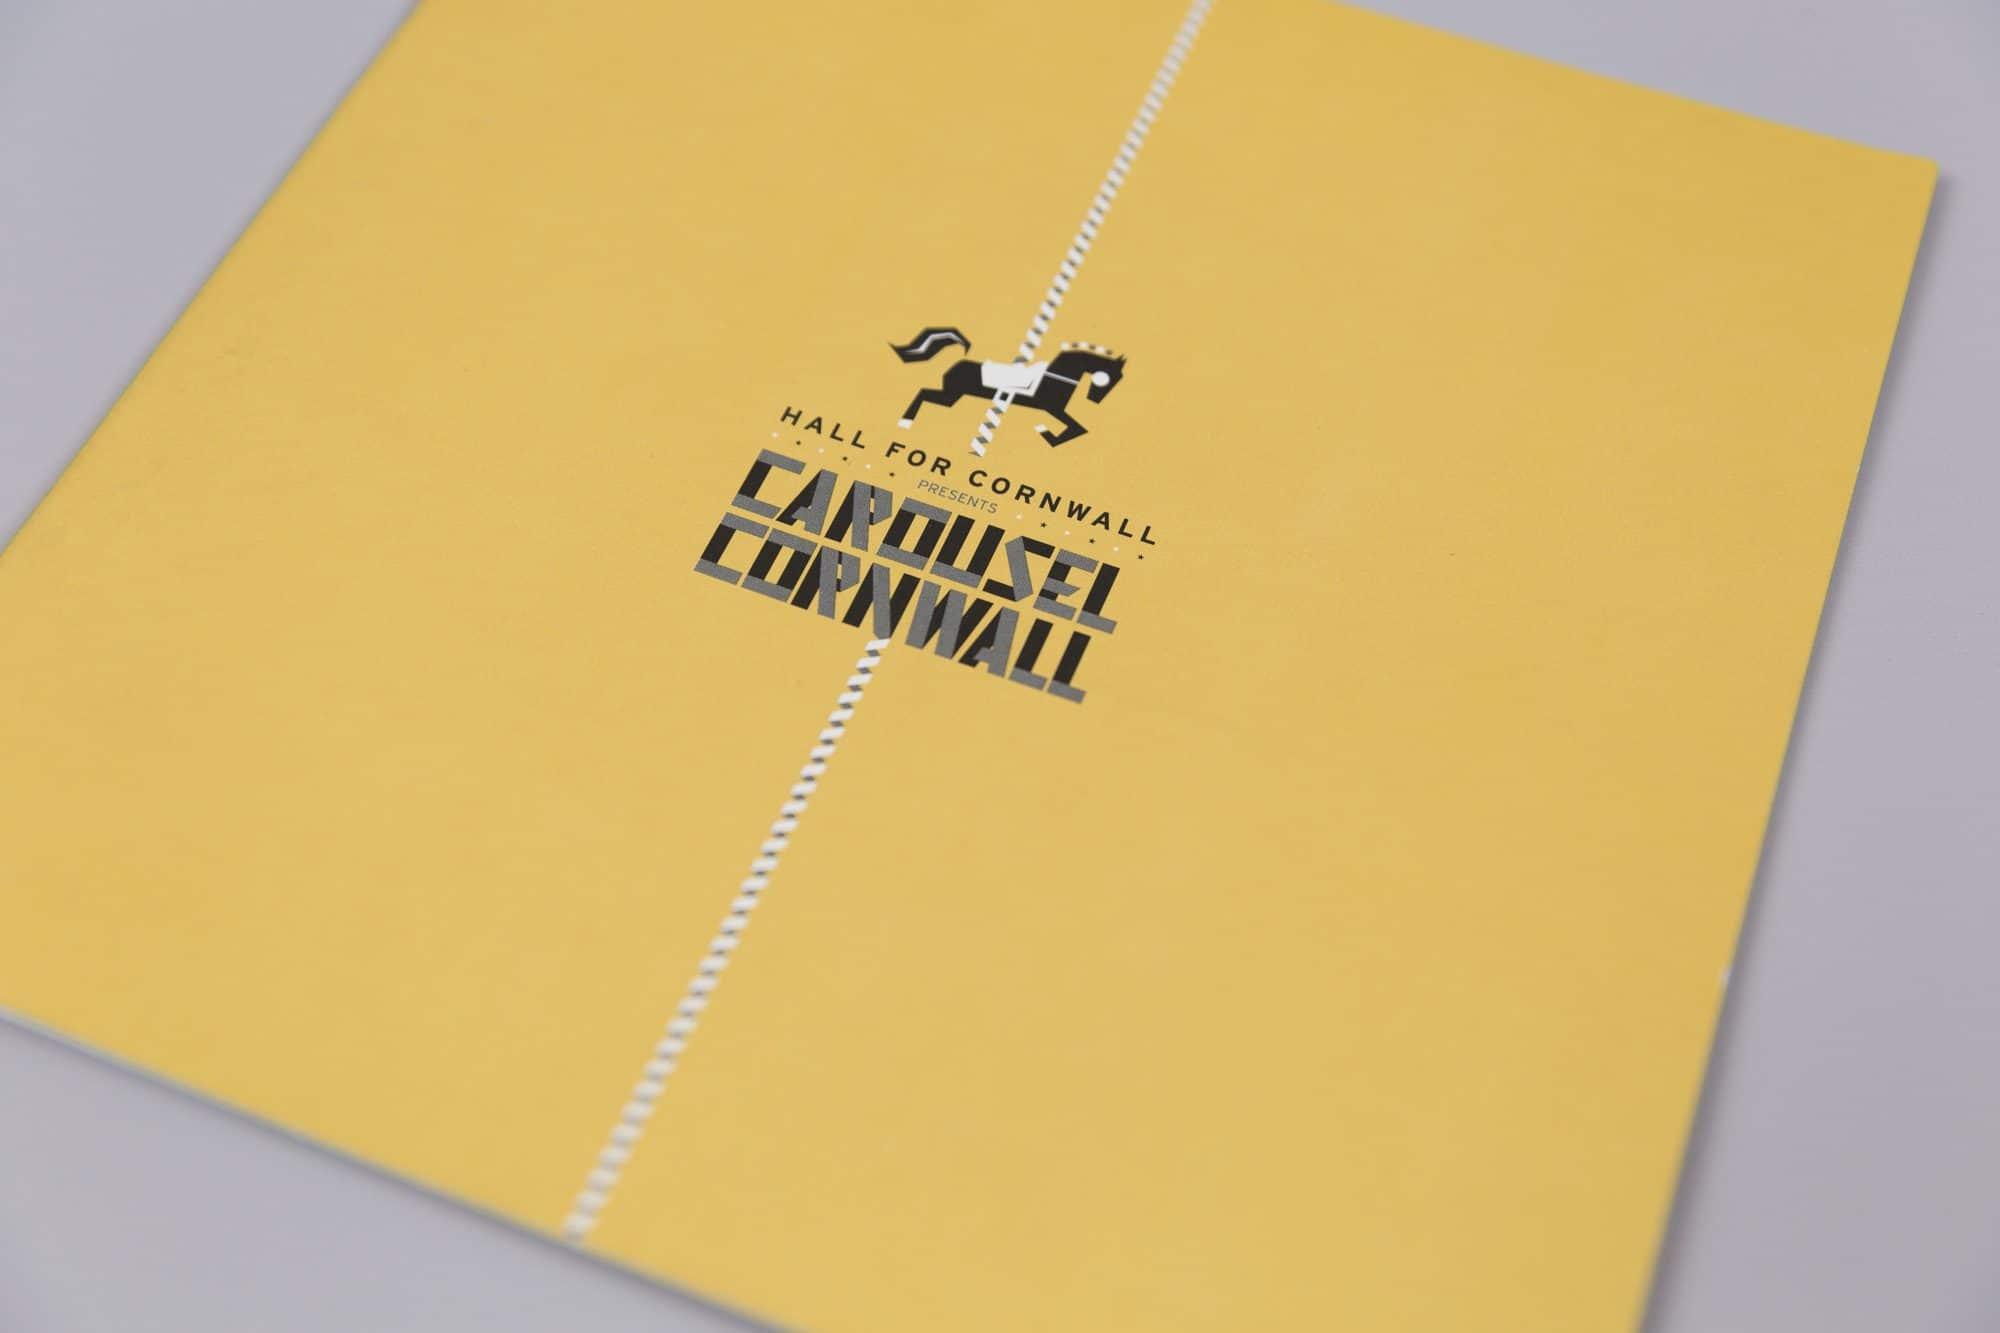 HfC - Cornwall Carousel